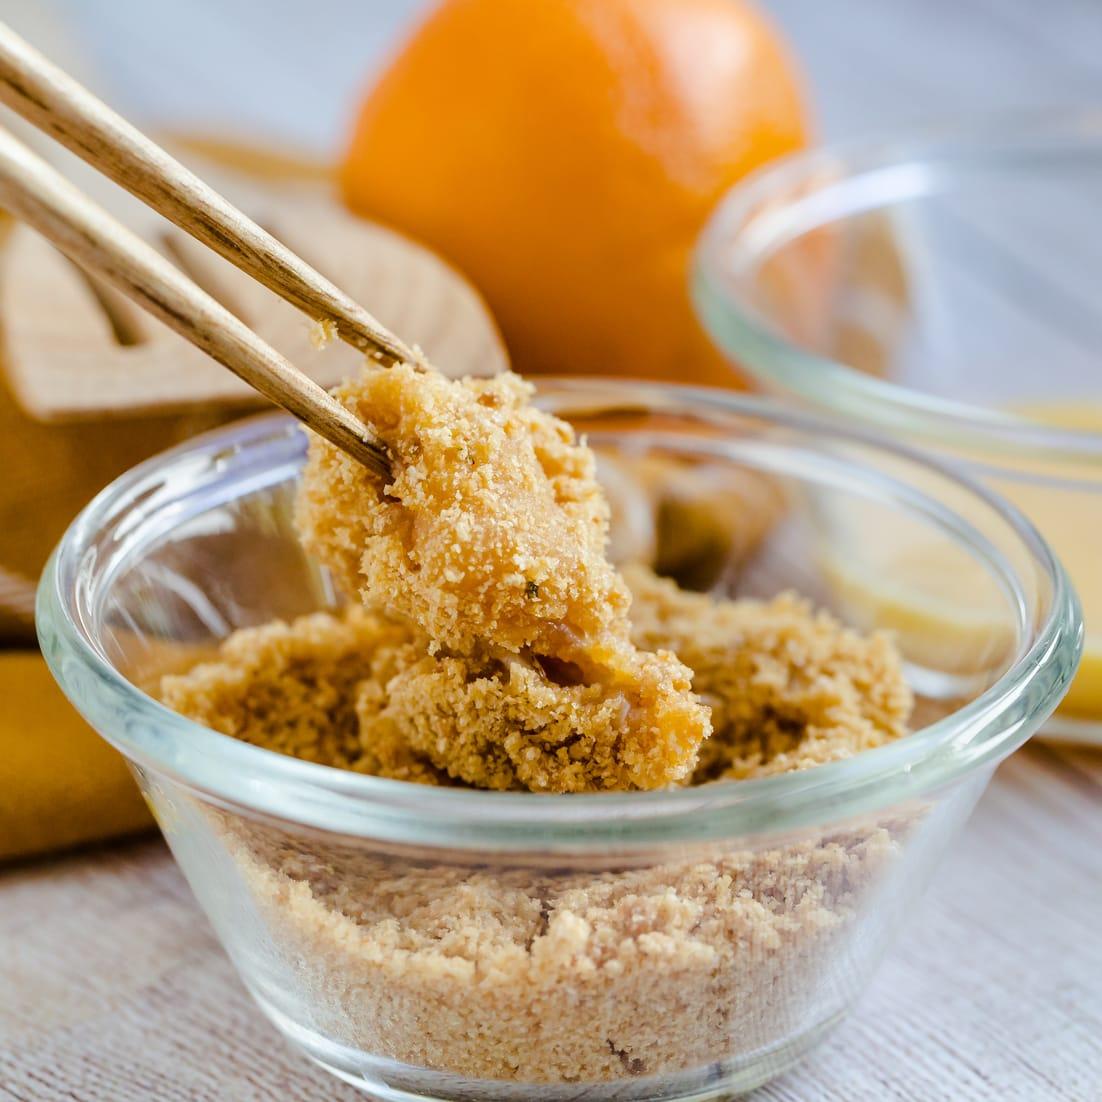 Keto Orange Chicken being dipped in panko pork rinds